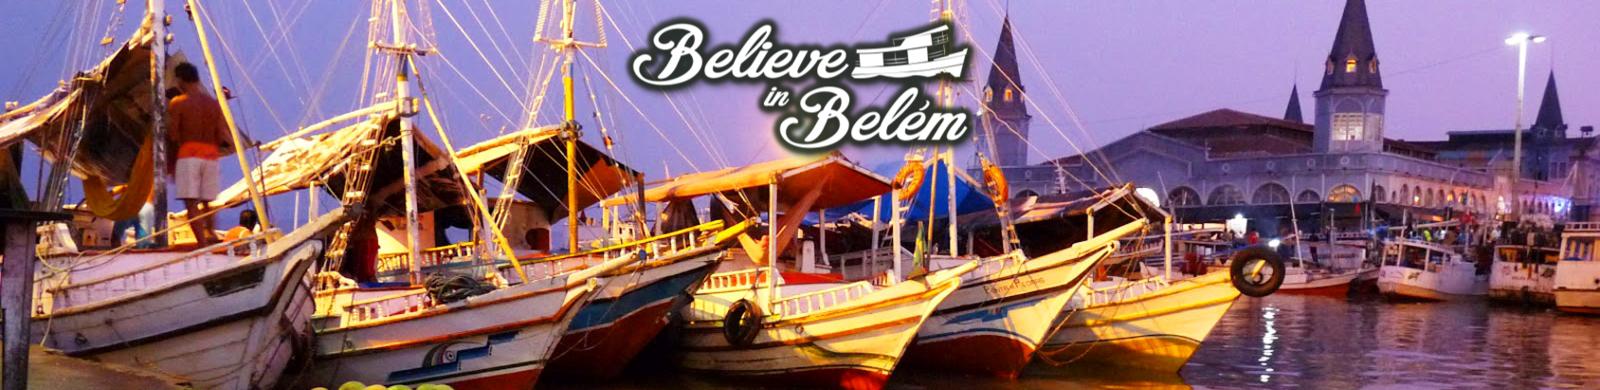 Environmental Education in the Amazon [Planet Heroes Belém]